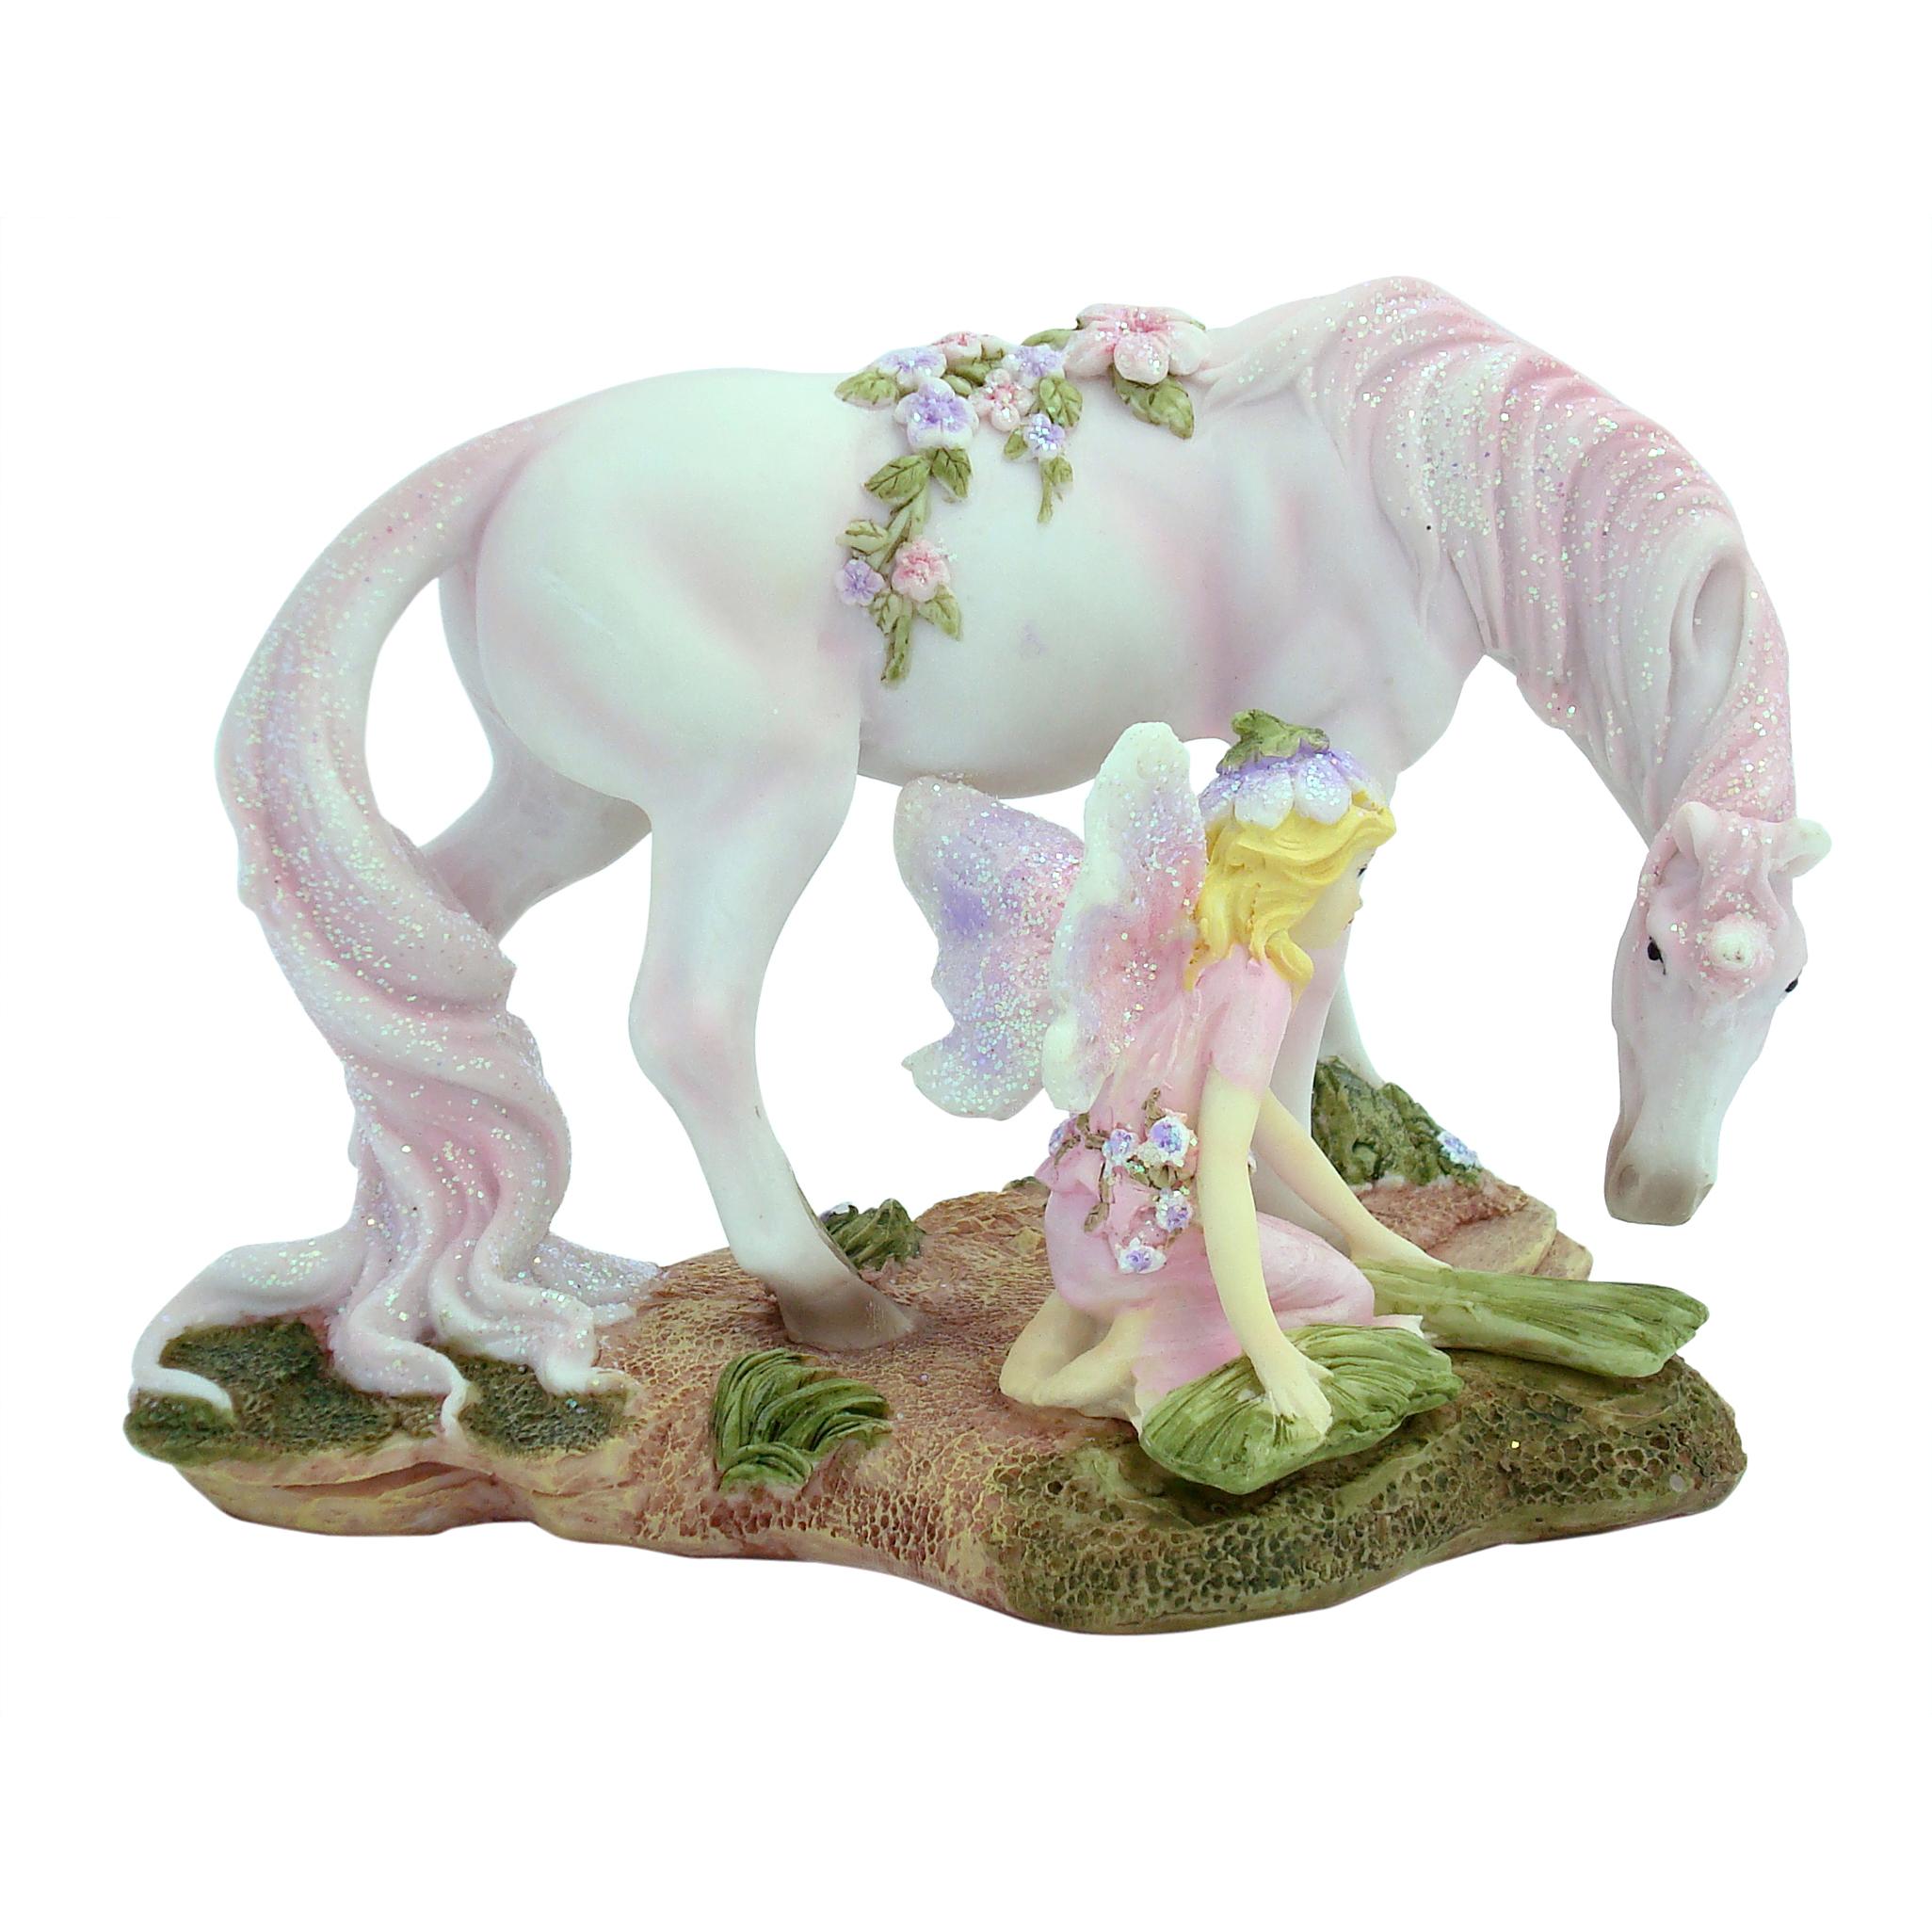 Fairy with Unicorn - 17.5cm - Restock ETA 5/9/17